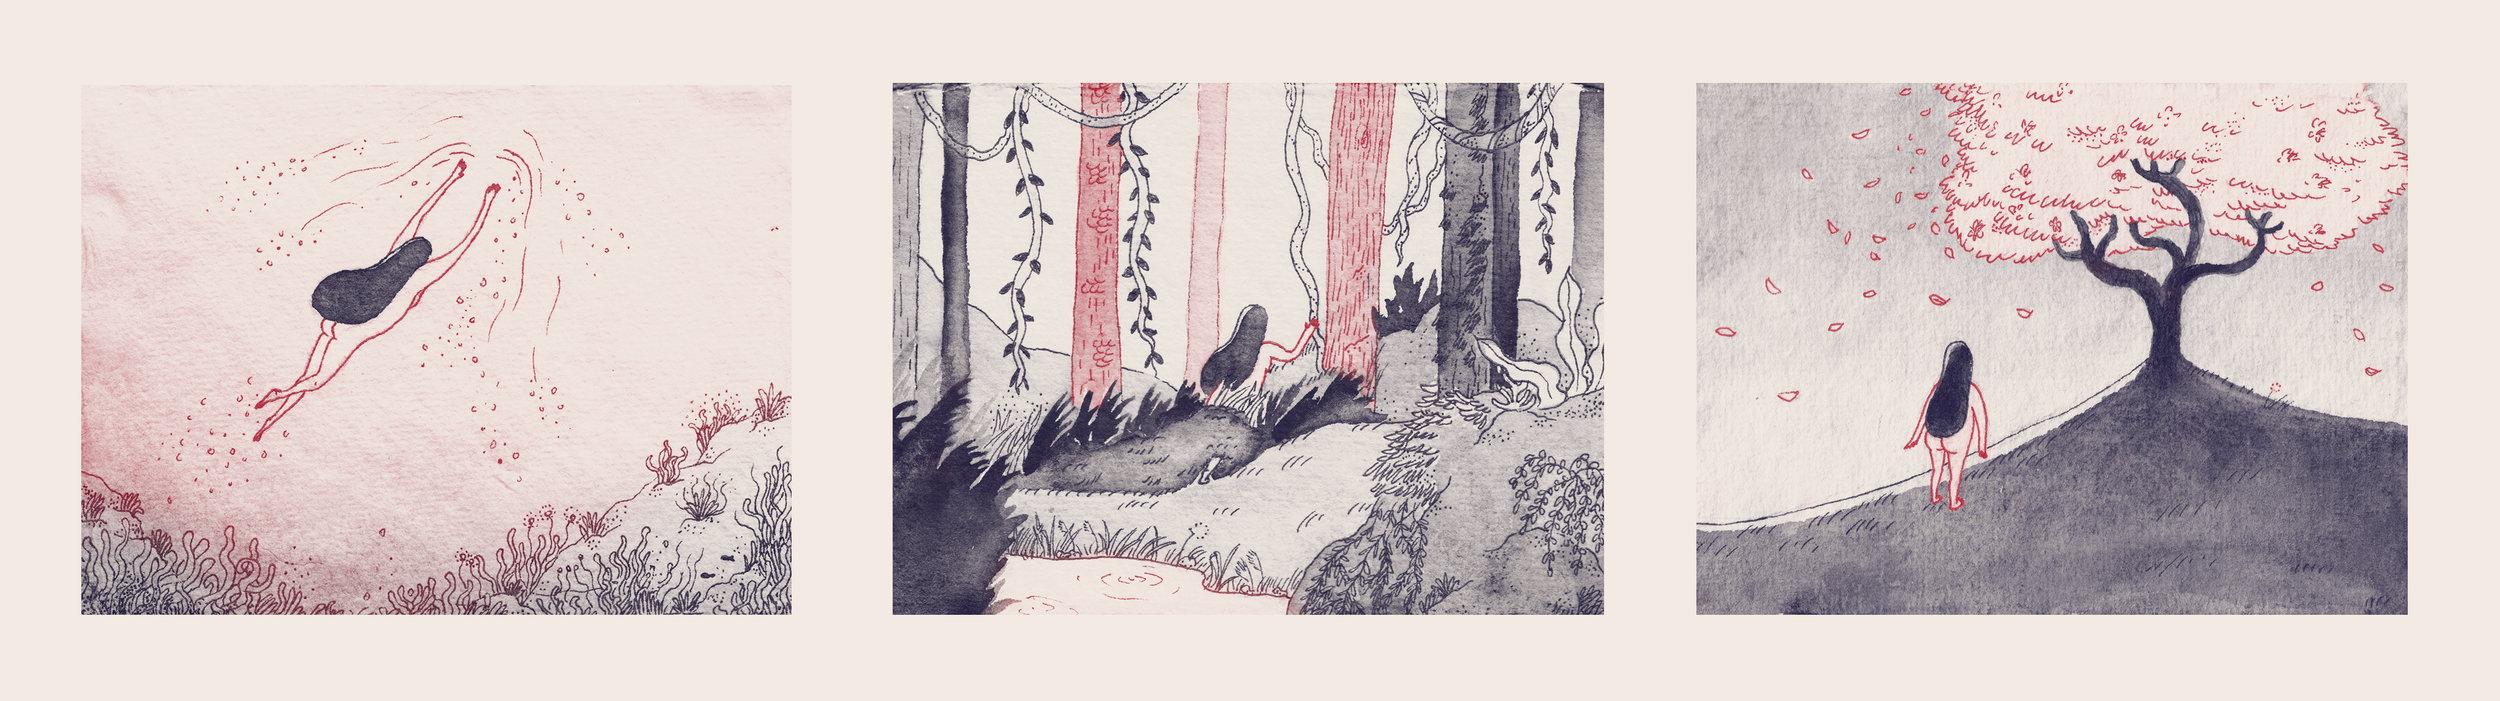 illustrations -